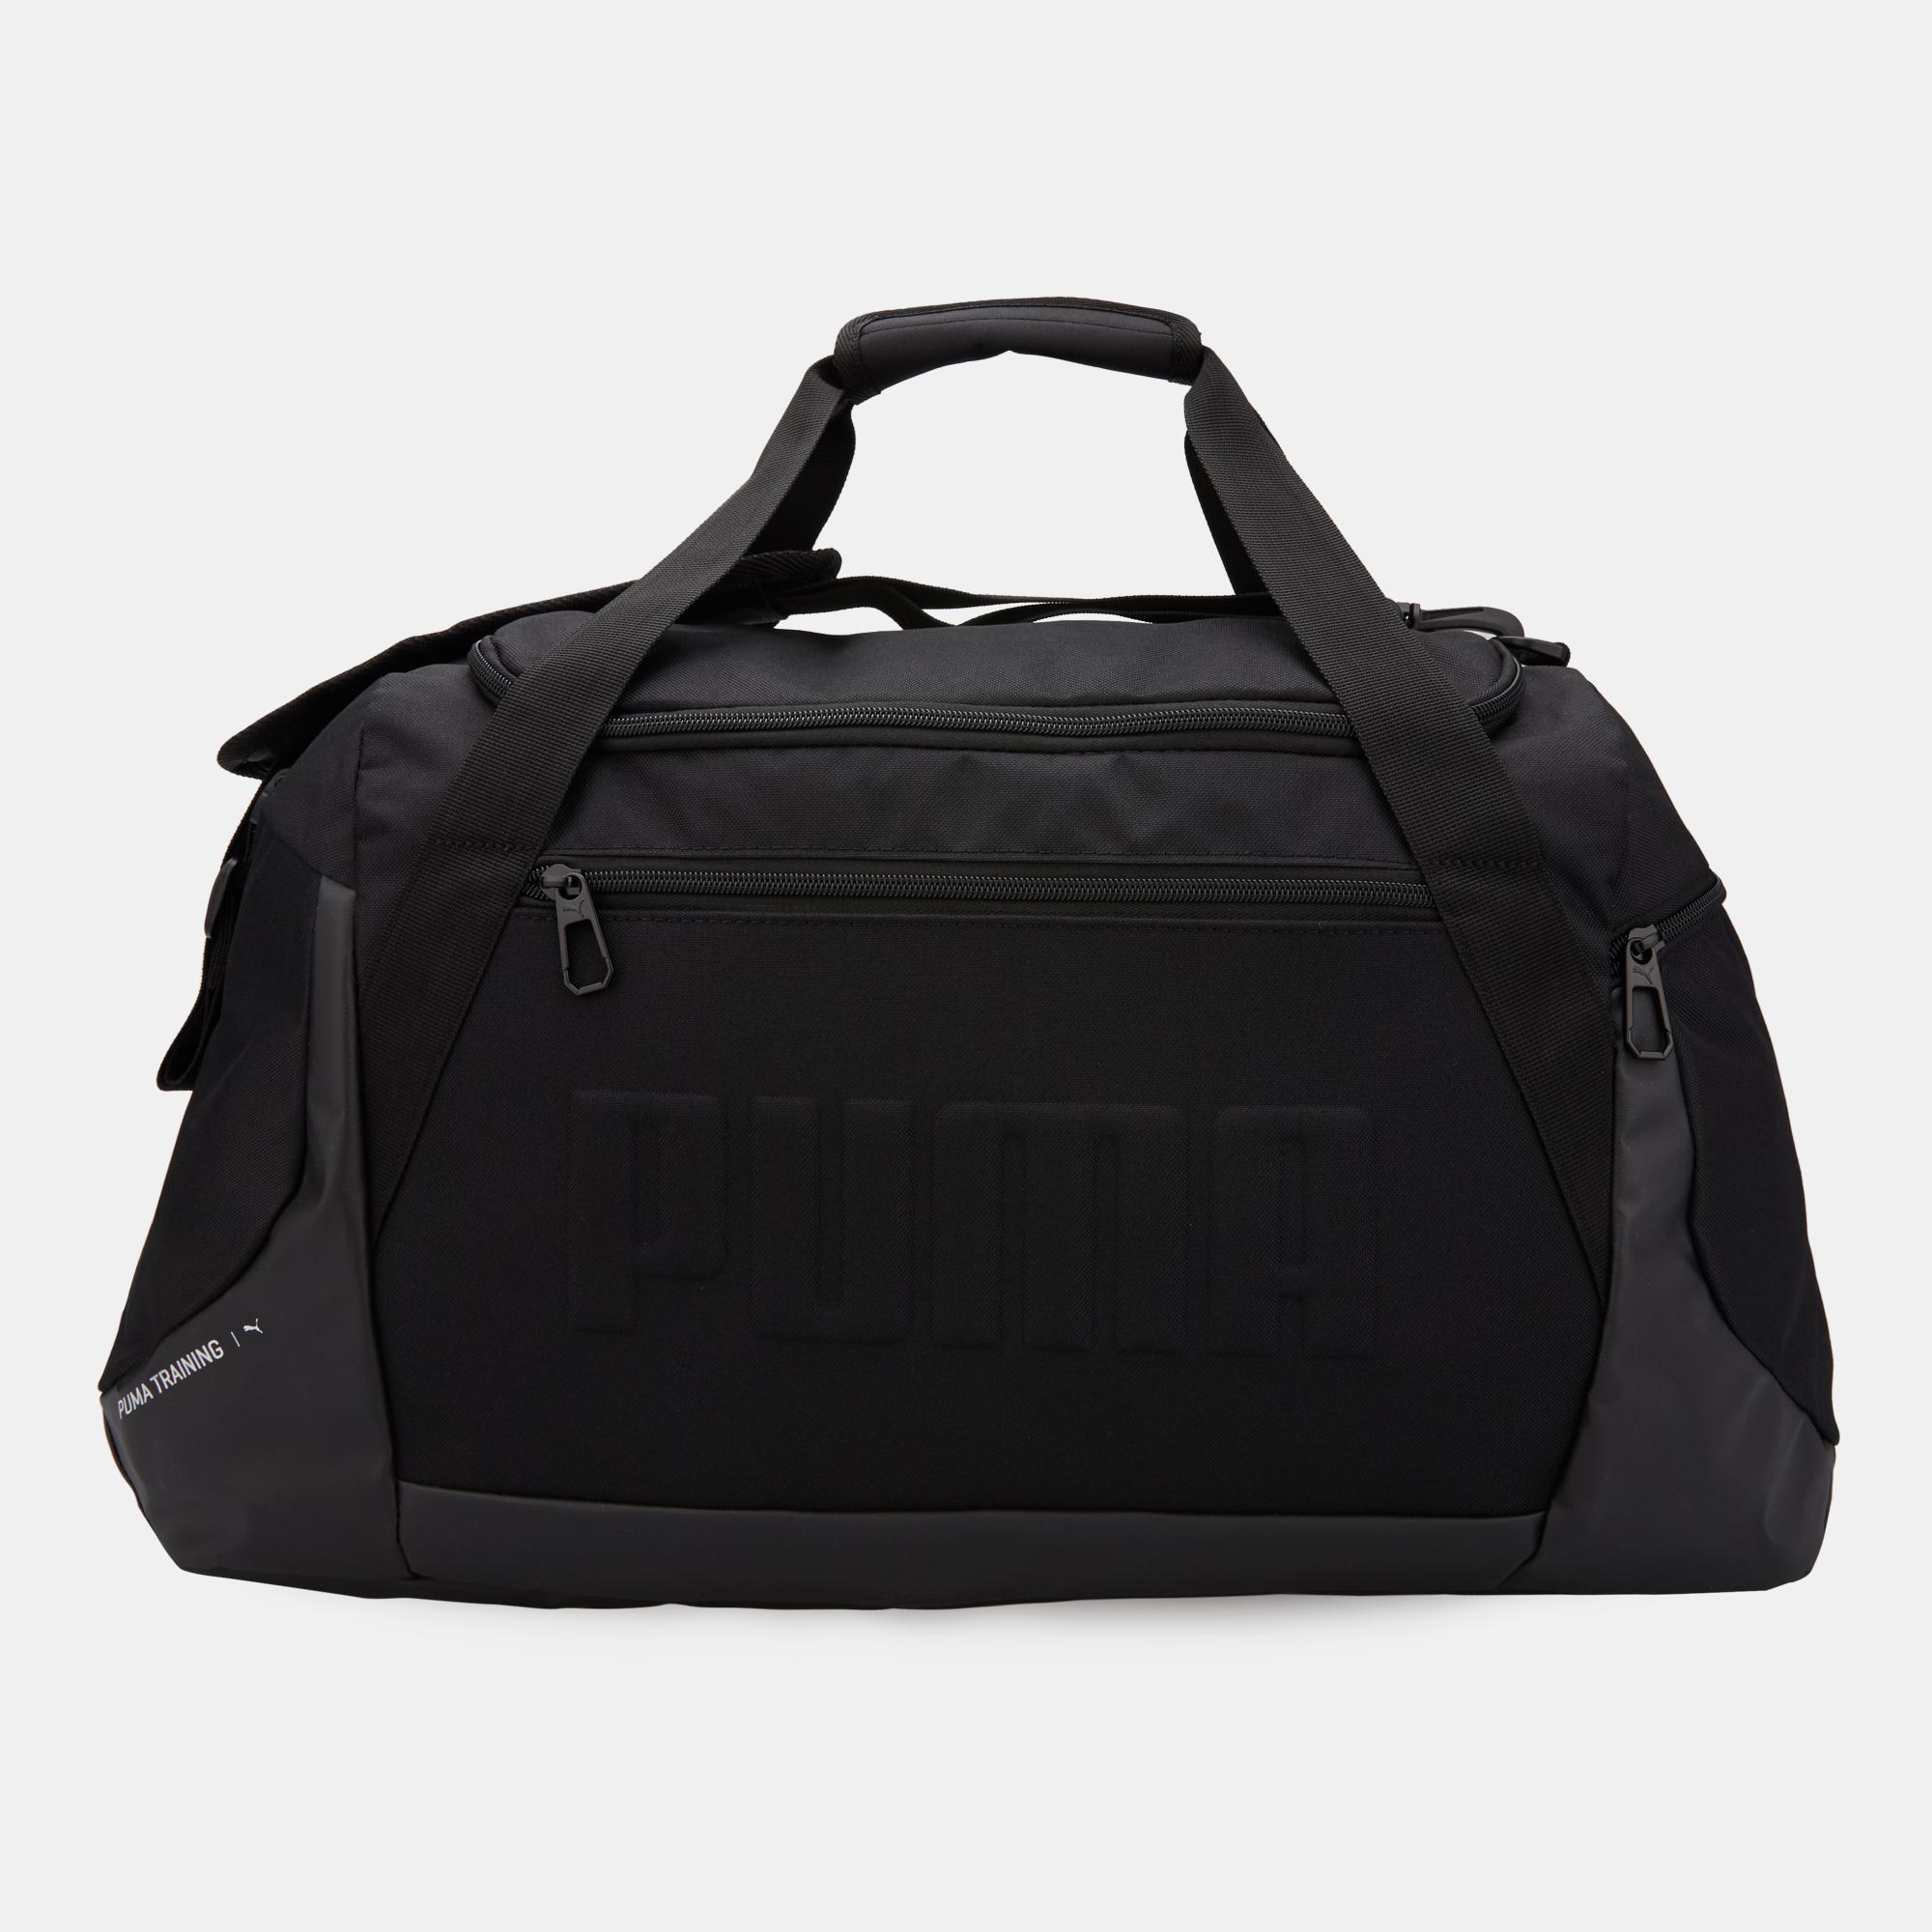 d33a86cd3053cf PUMA Men's Gym Duffle Medium Bag | Duffel Bags | Bags and Luggage ...